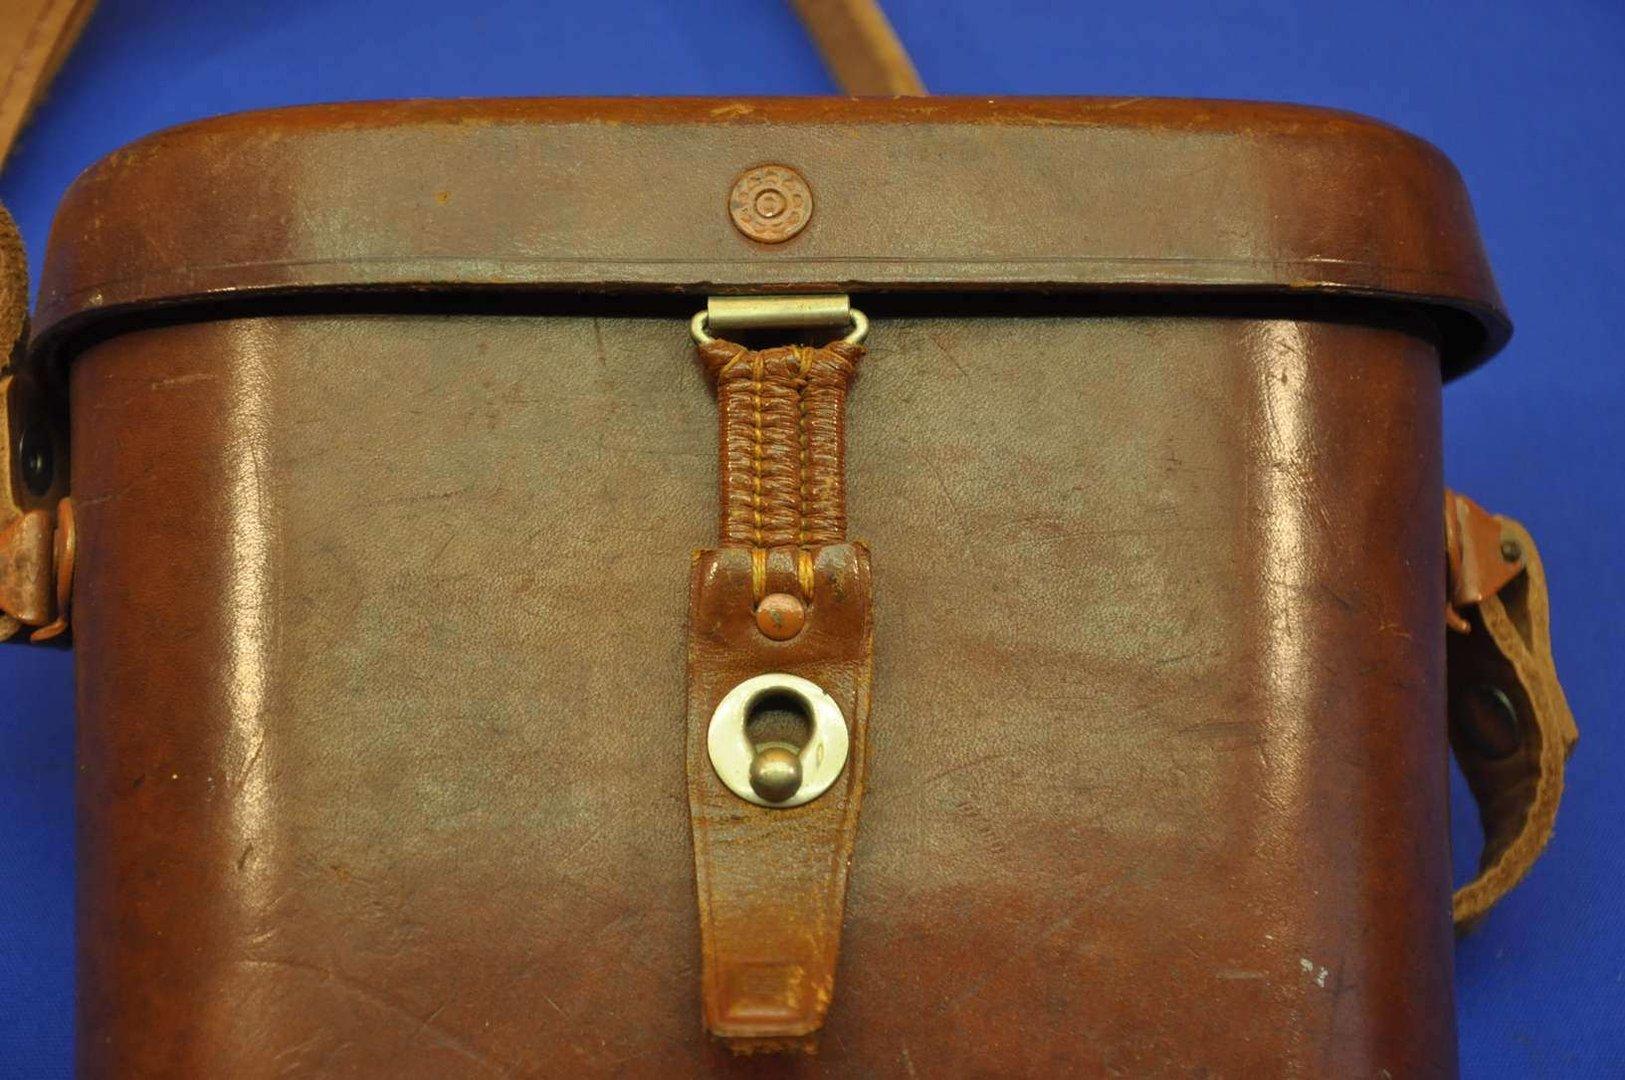 Fernglas carl zeiss jena notarem b mc im lederköcher ebay